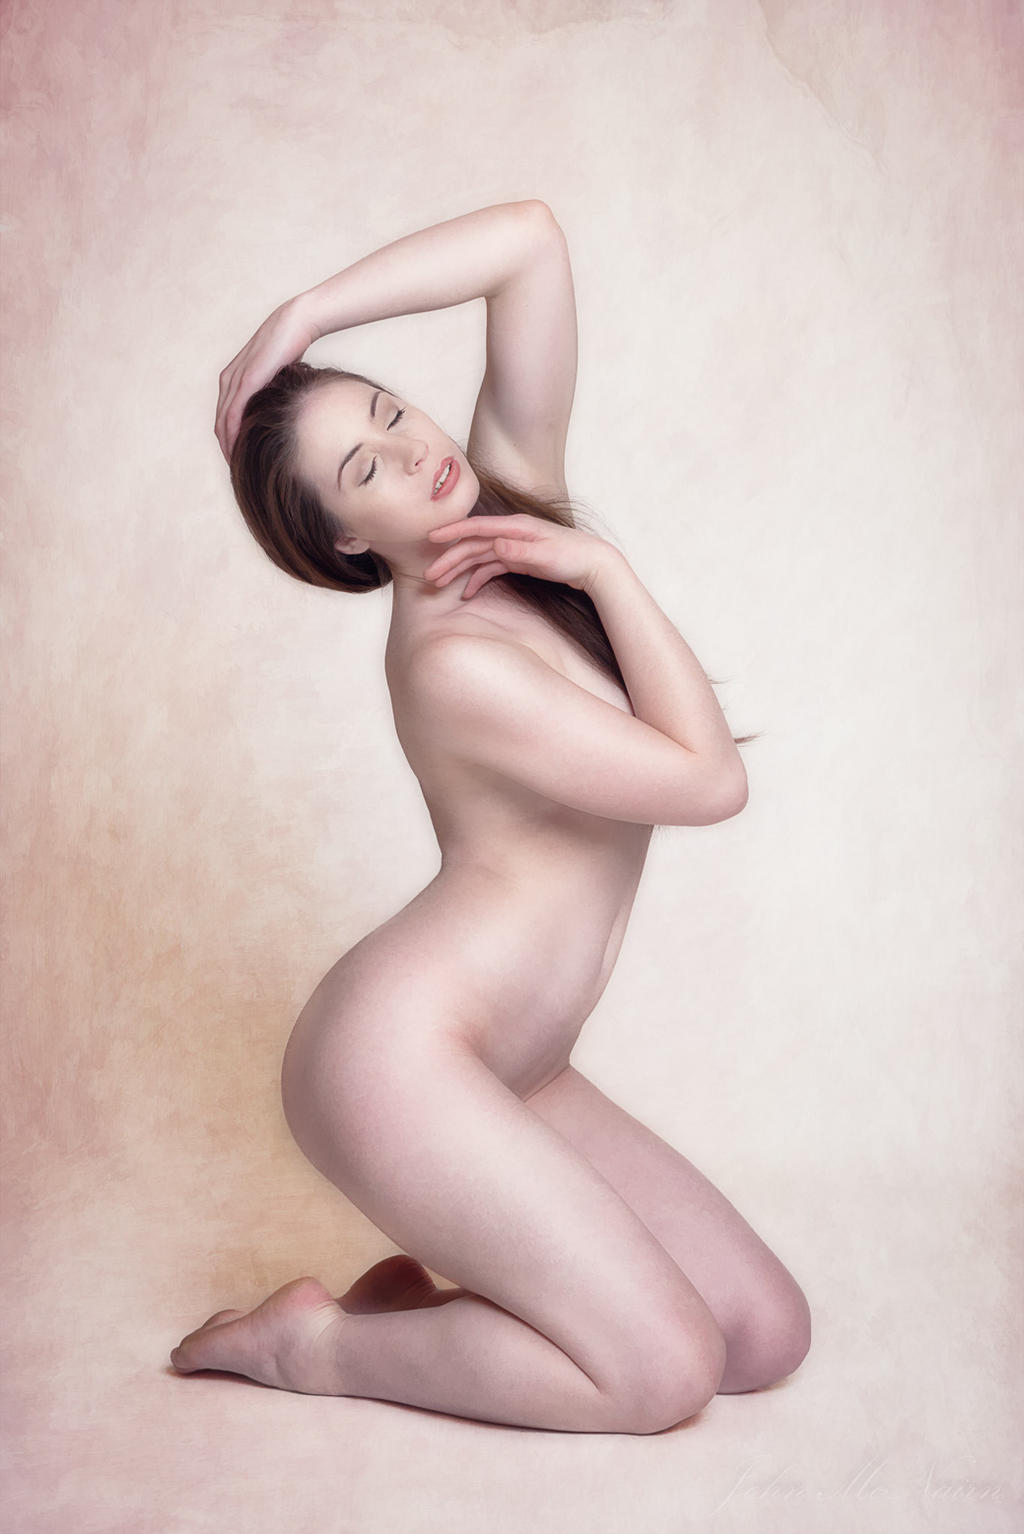 Elle in Blush by Fox2006